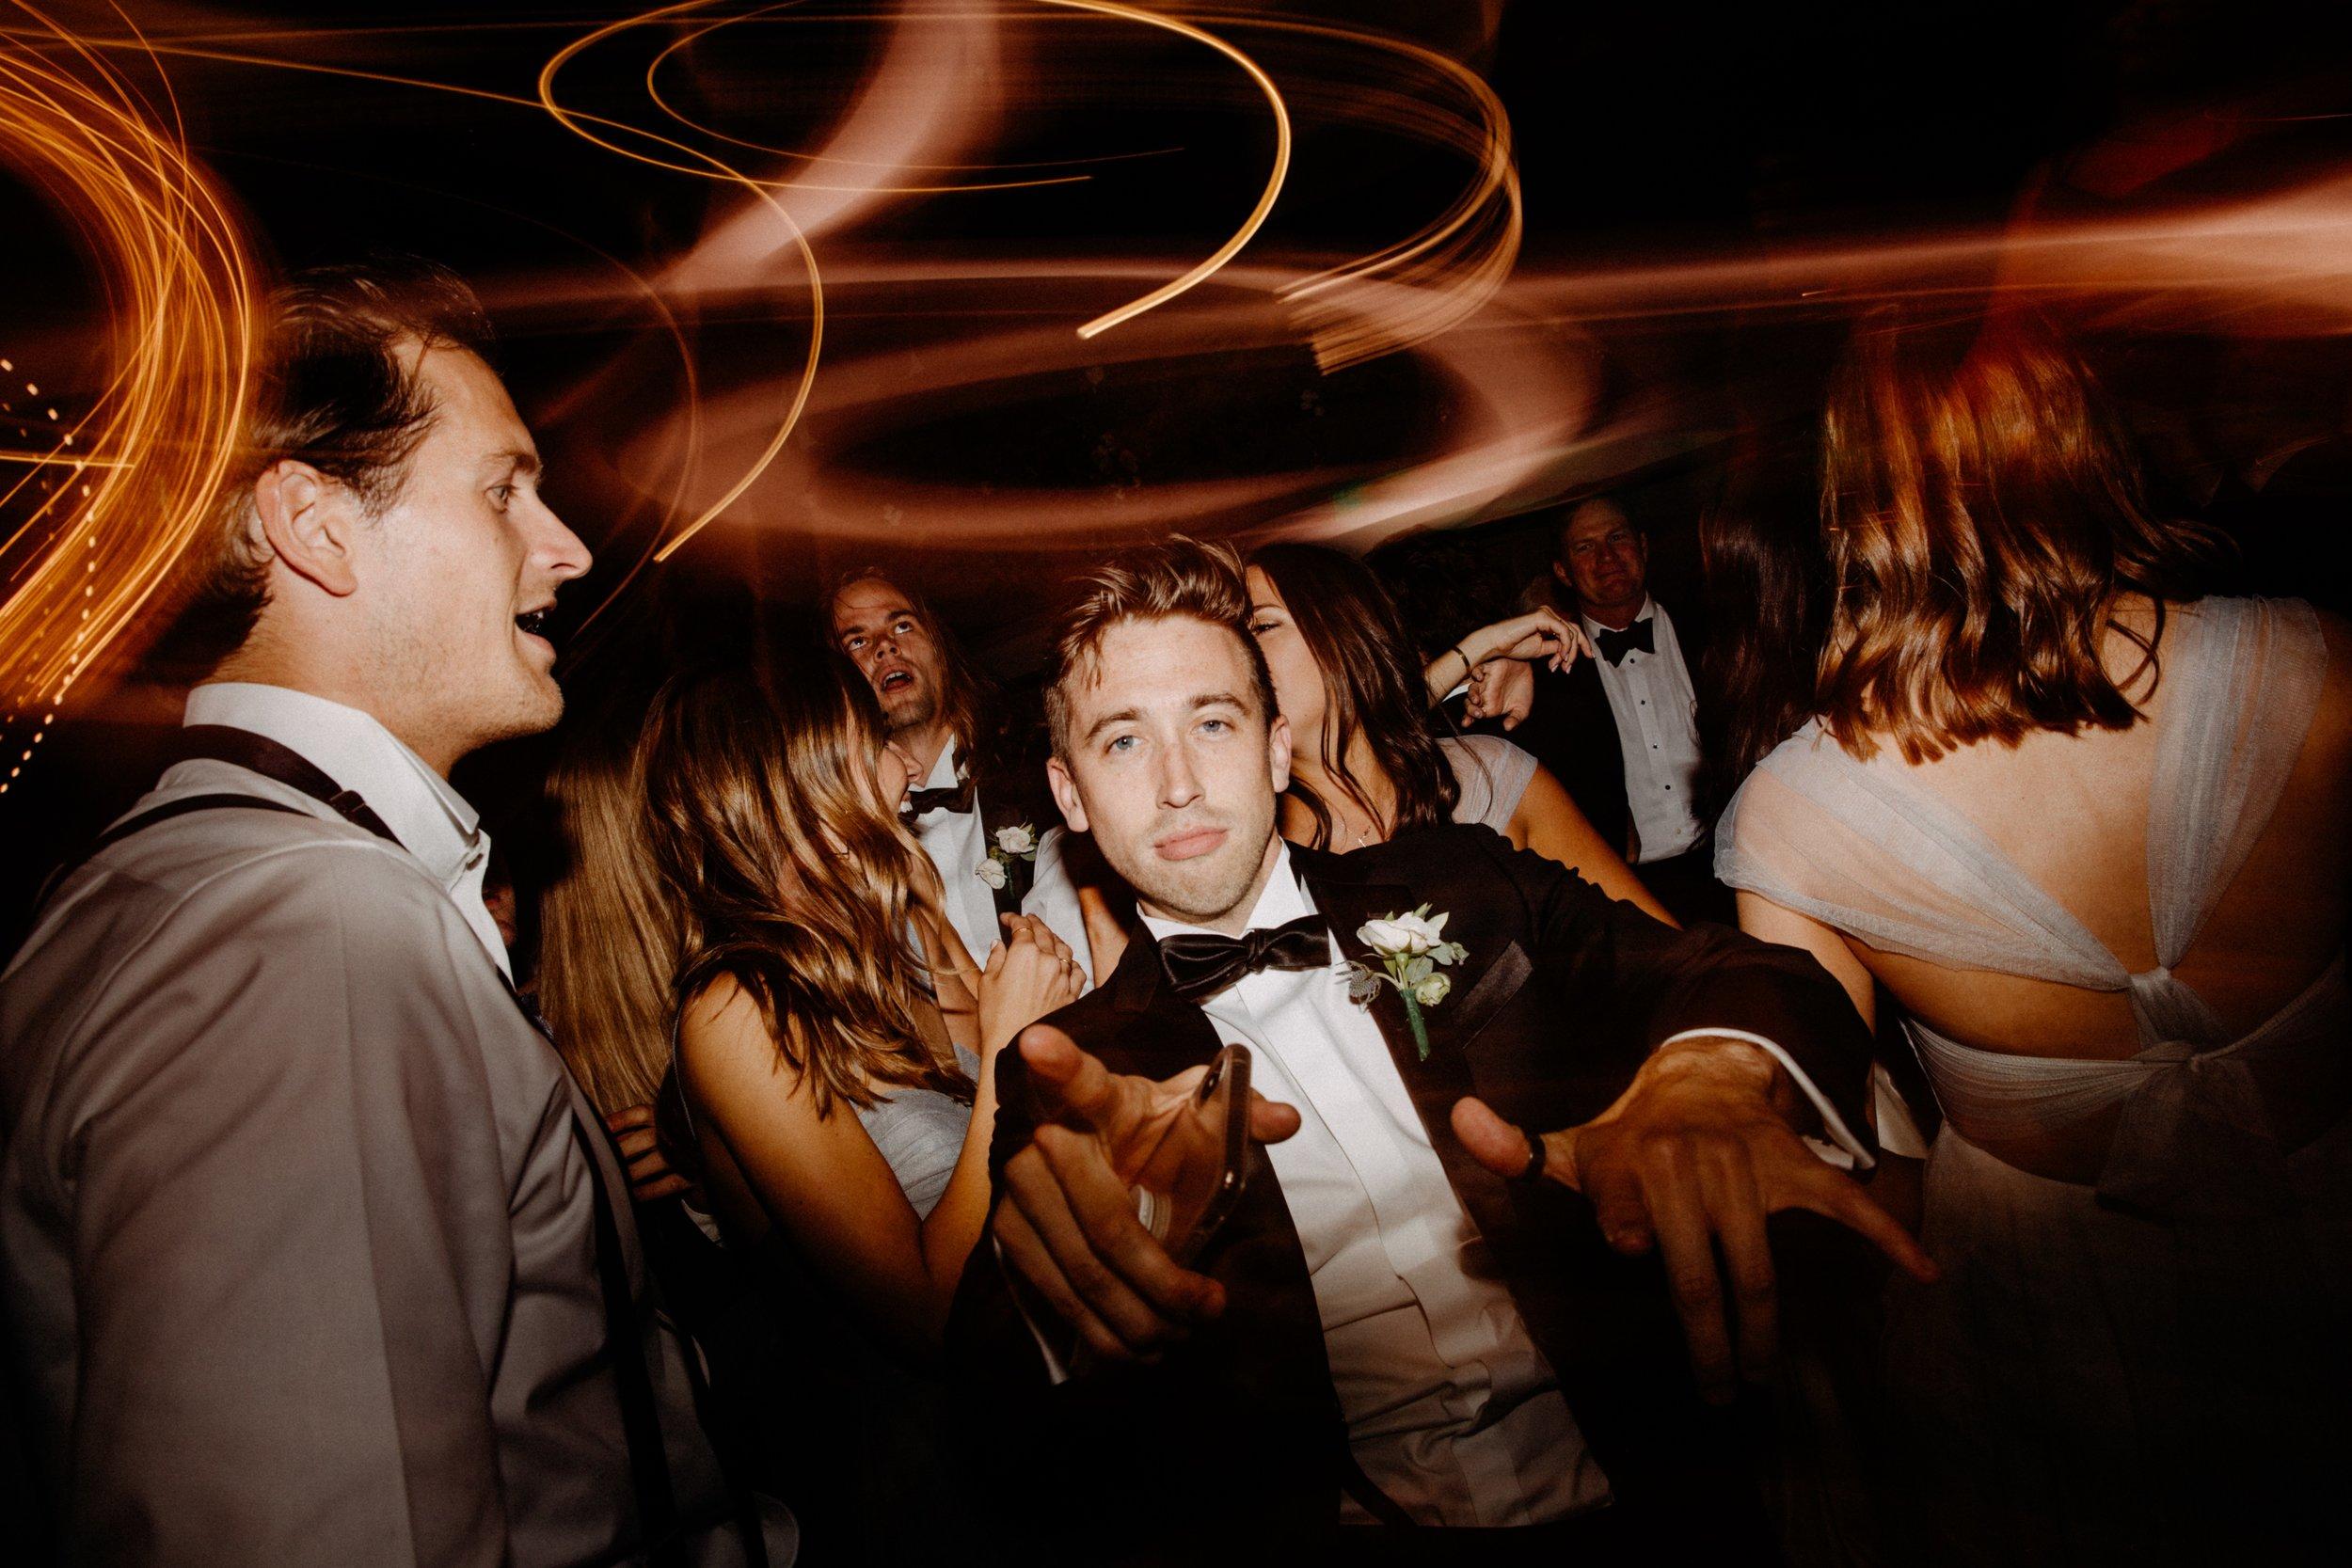 st-anthony-hotel-wedding-photography-10163san-antonio.JPG